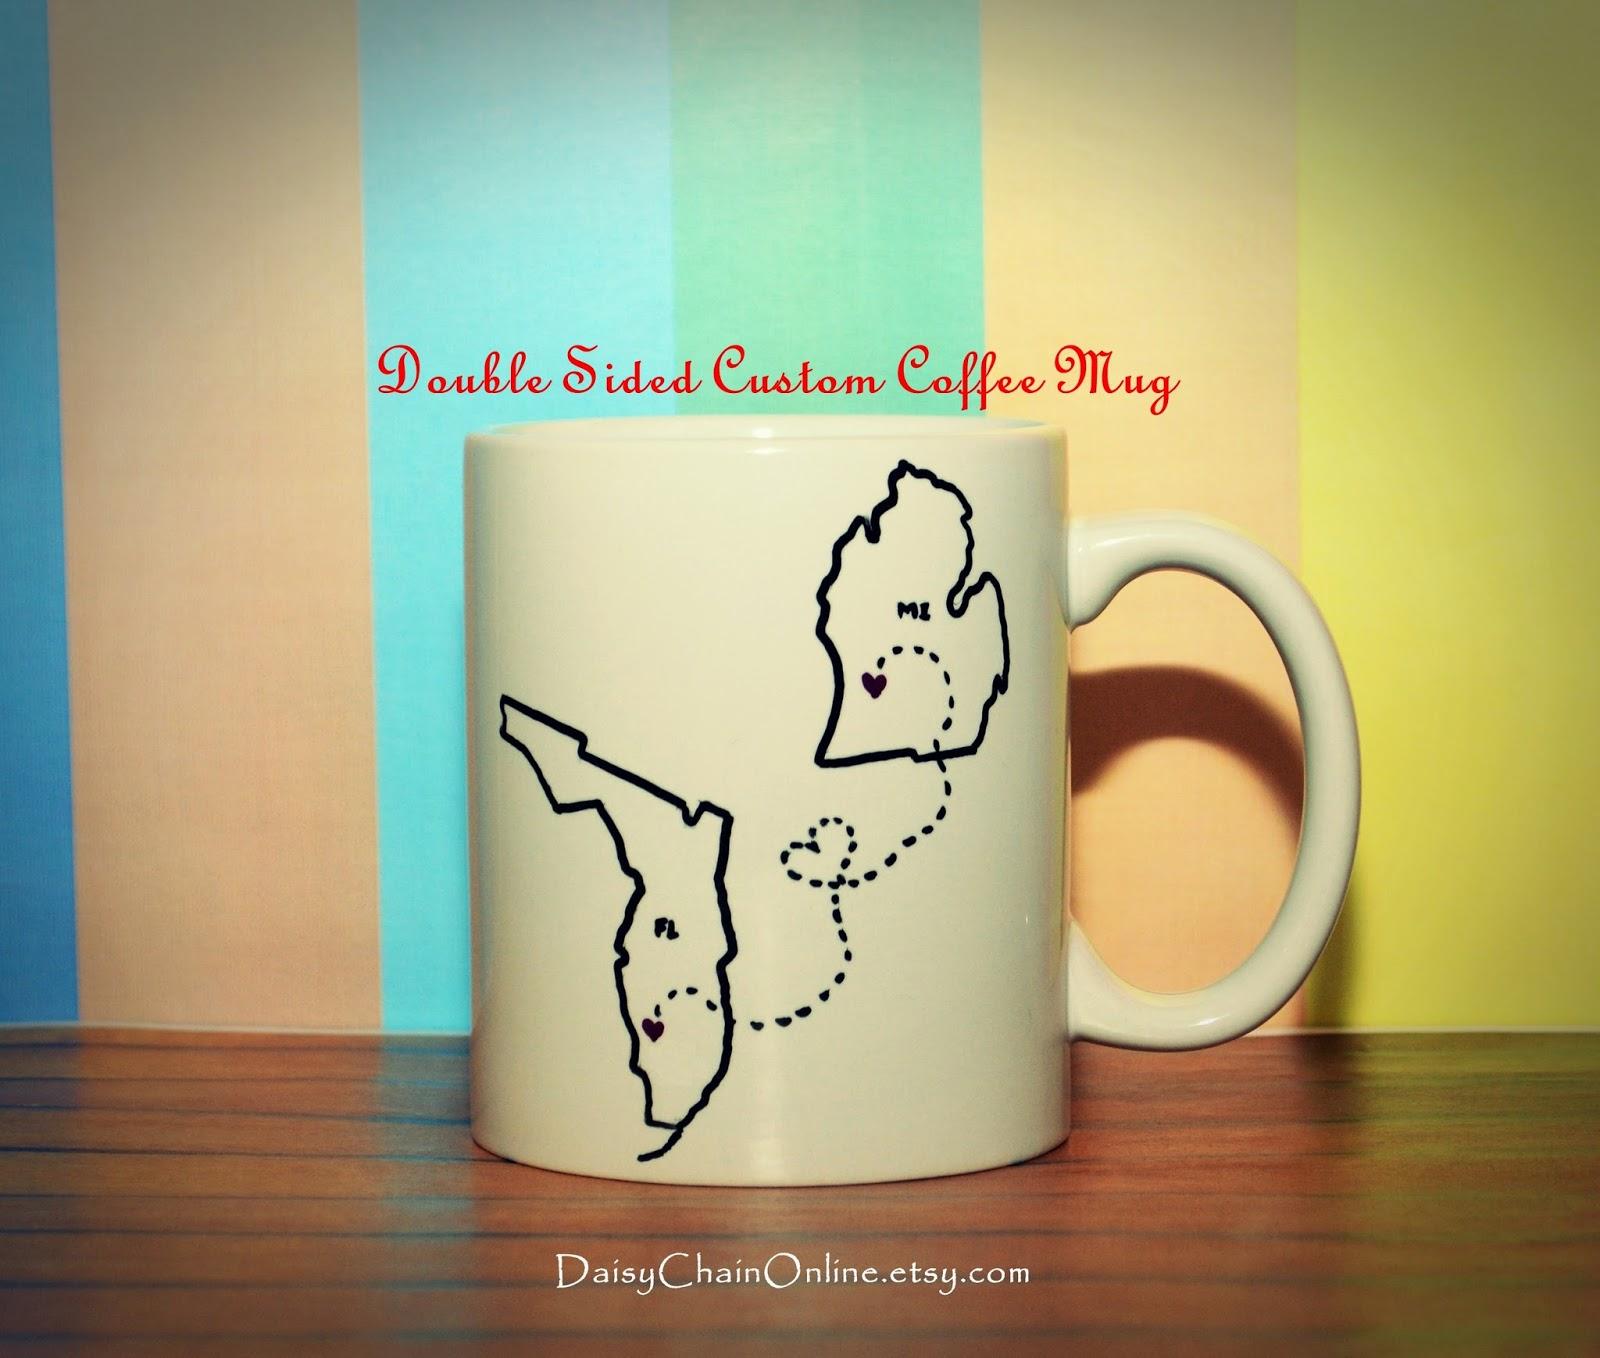 Best coffee mugs etsy - Best Friend Coffee Mugs Sisters Mugs Custom Mugs Personalized Mug